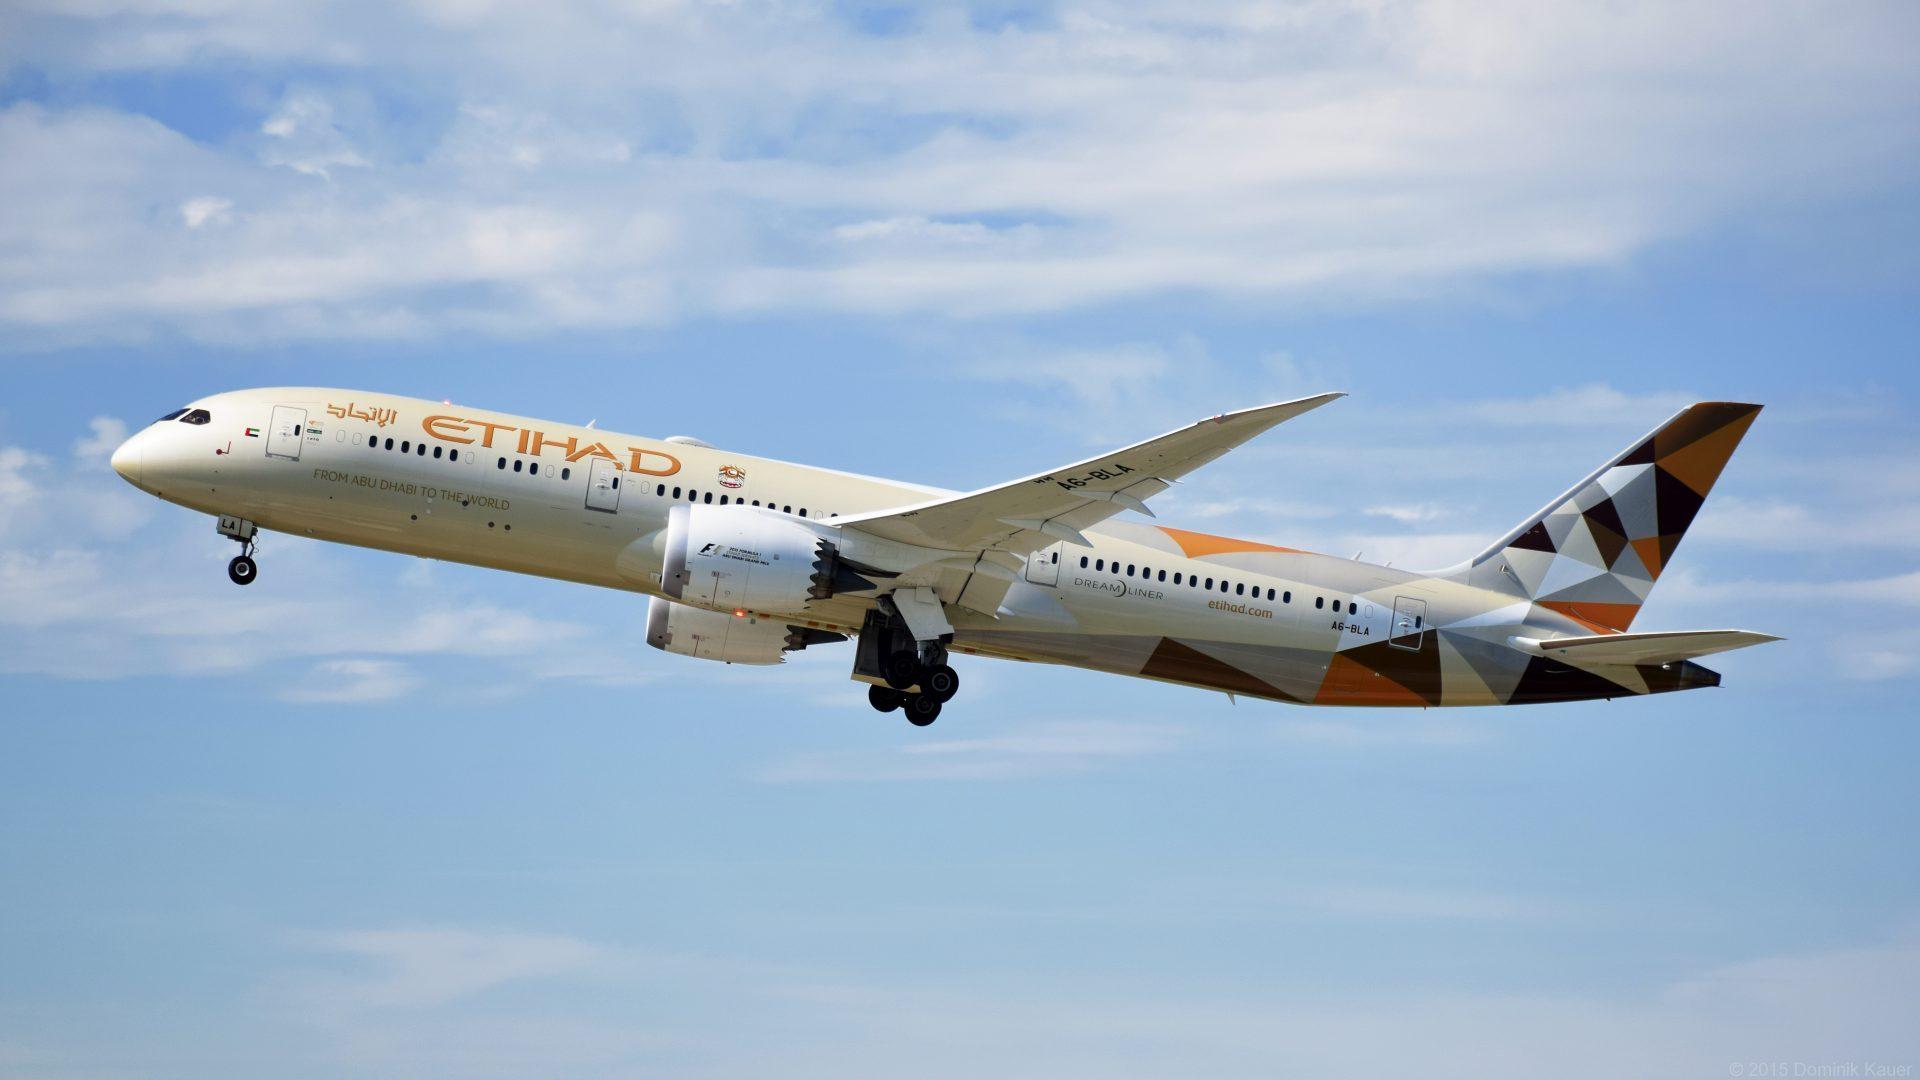 Etihad Airways To Deploy Boeing 787 On Flights To